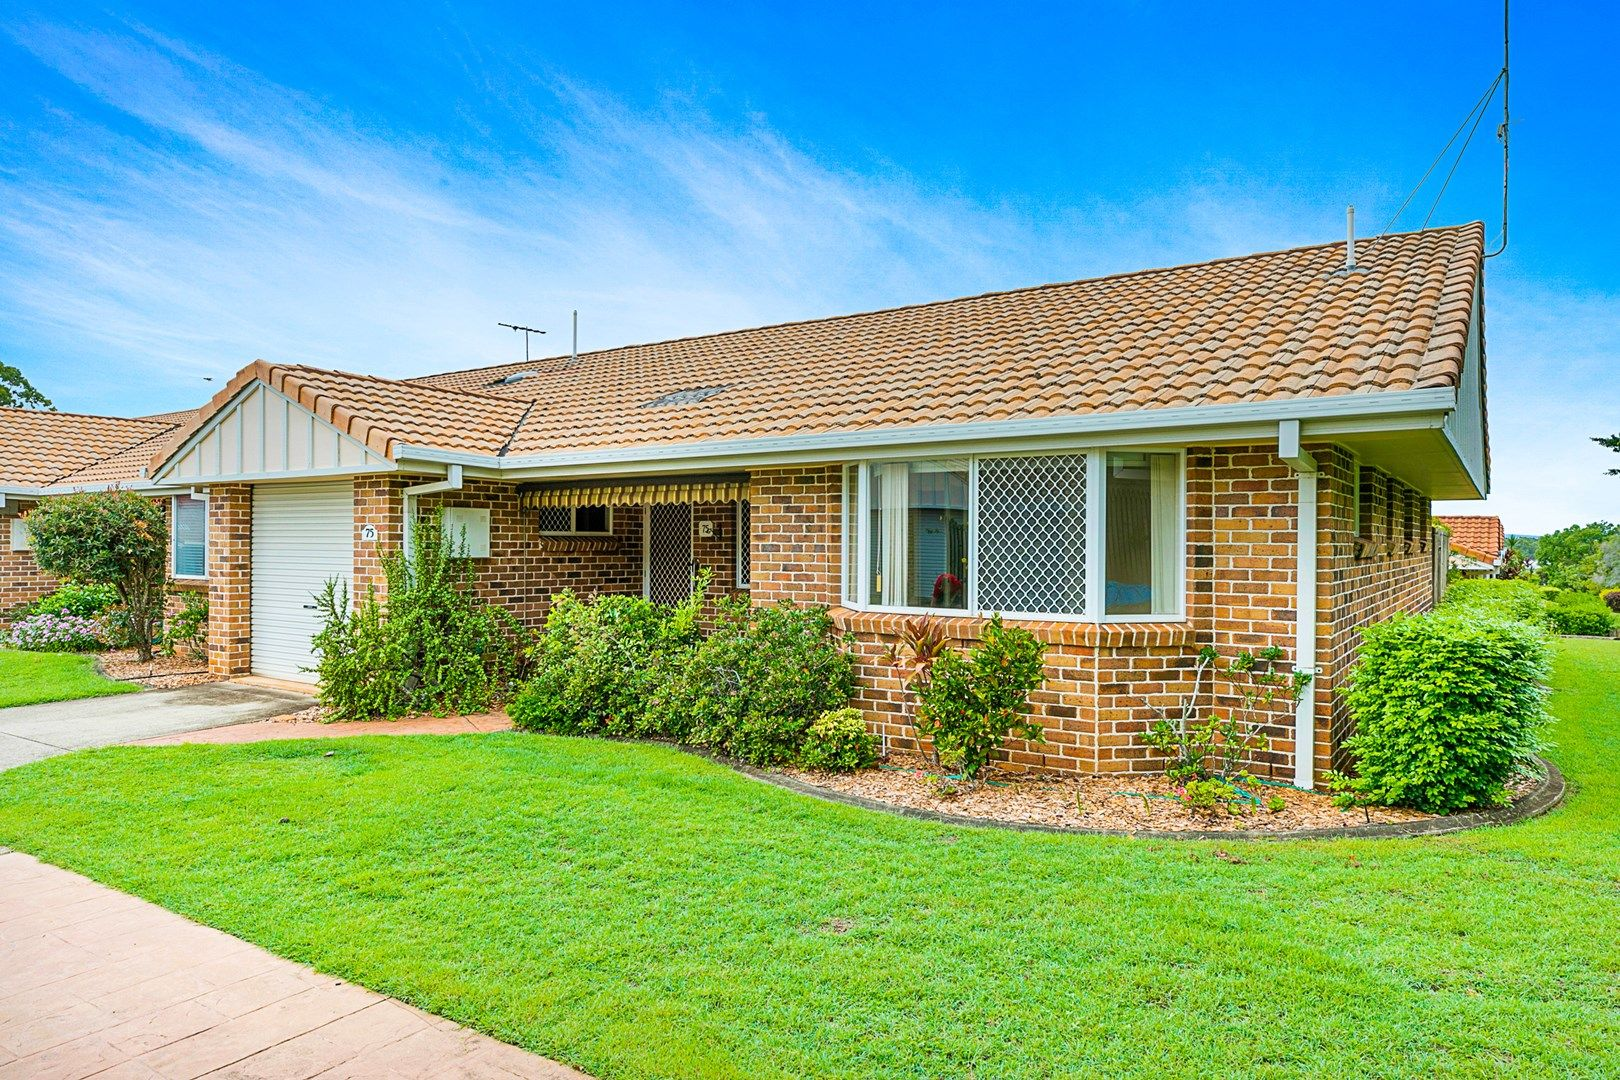 75/76-88 Freeth Street West, Ormiston QLD 4160, Image 0